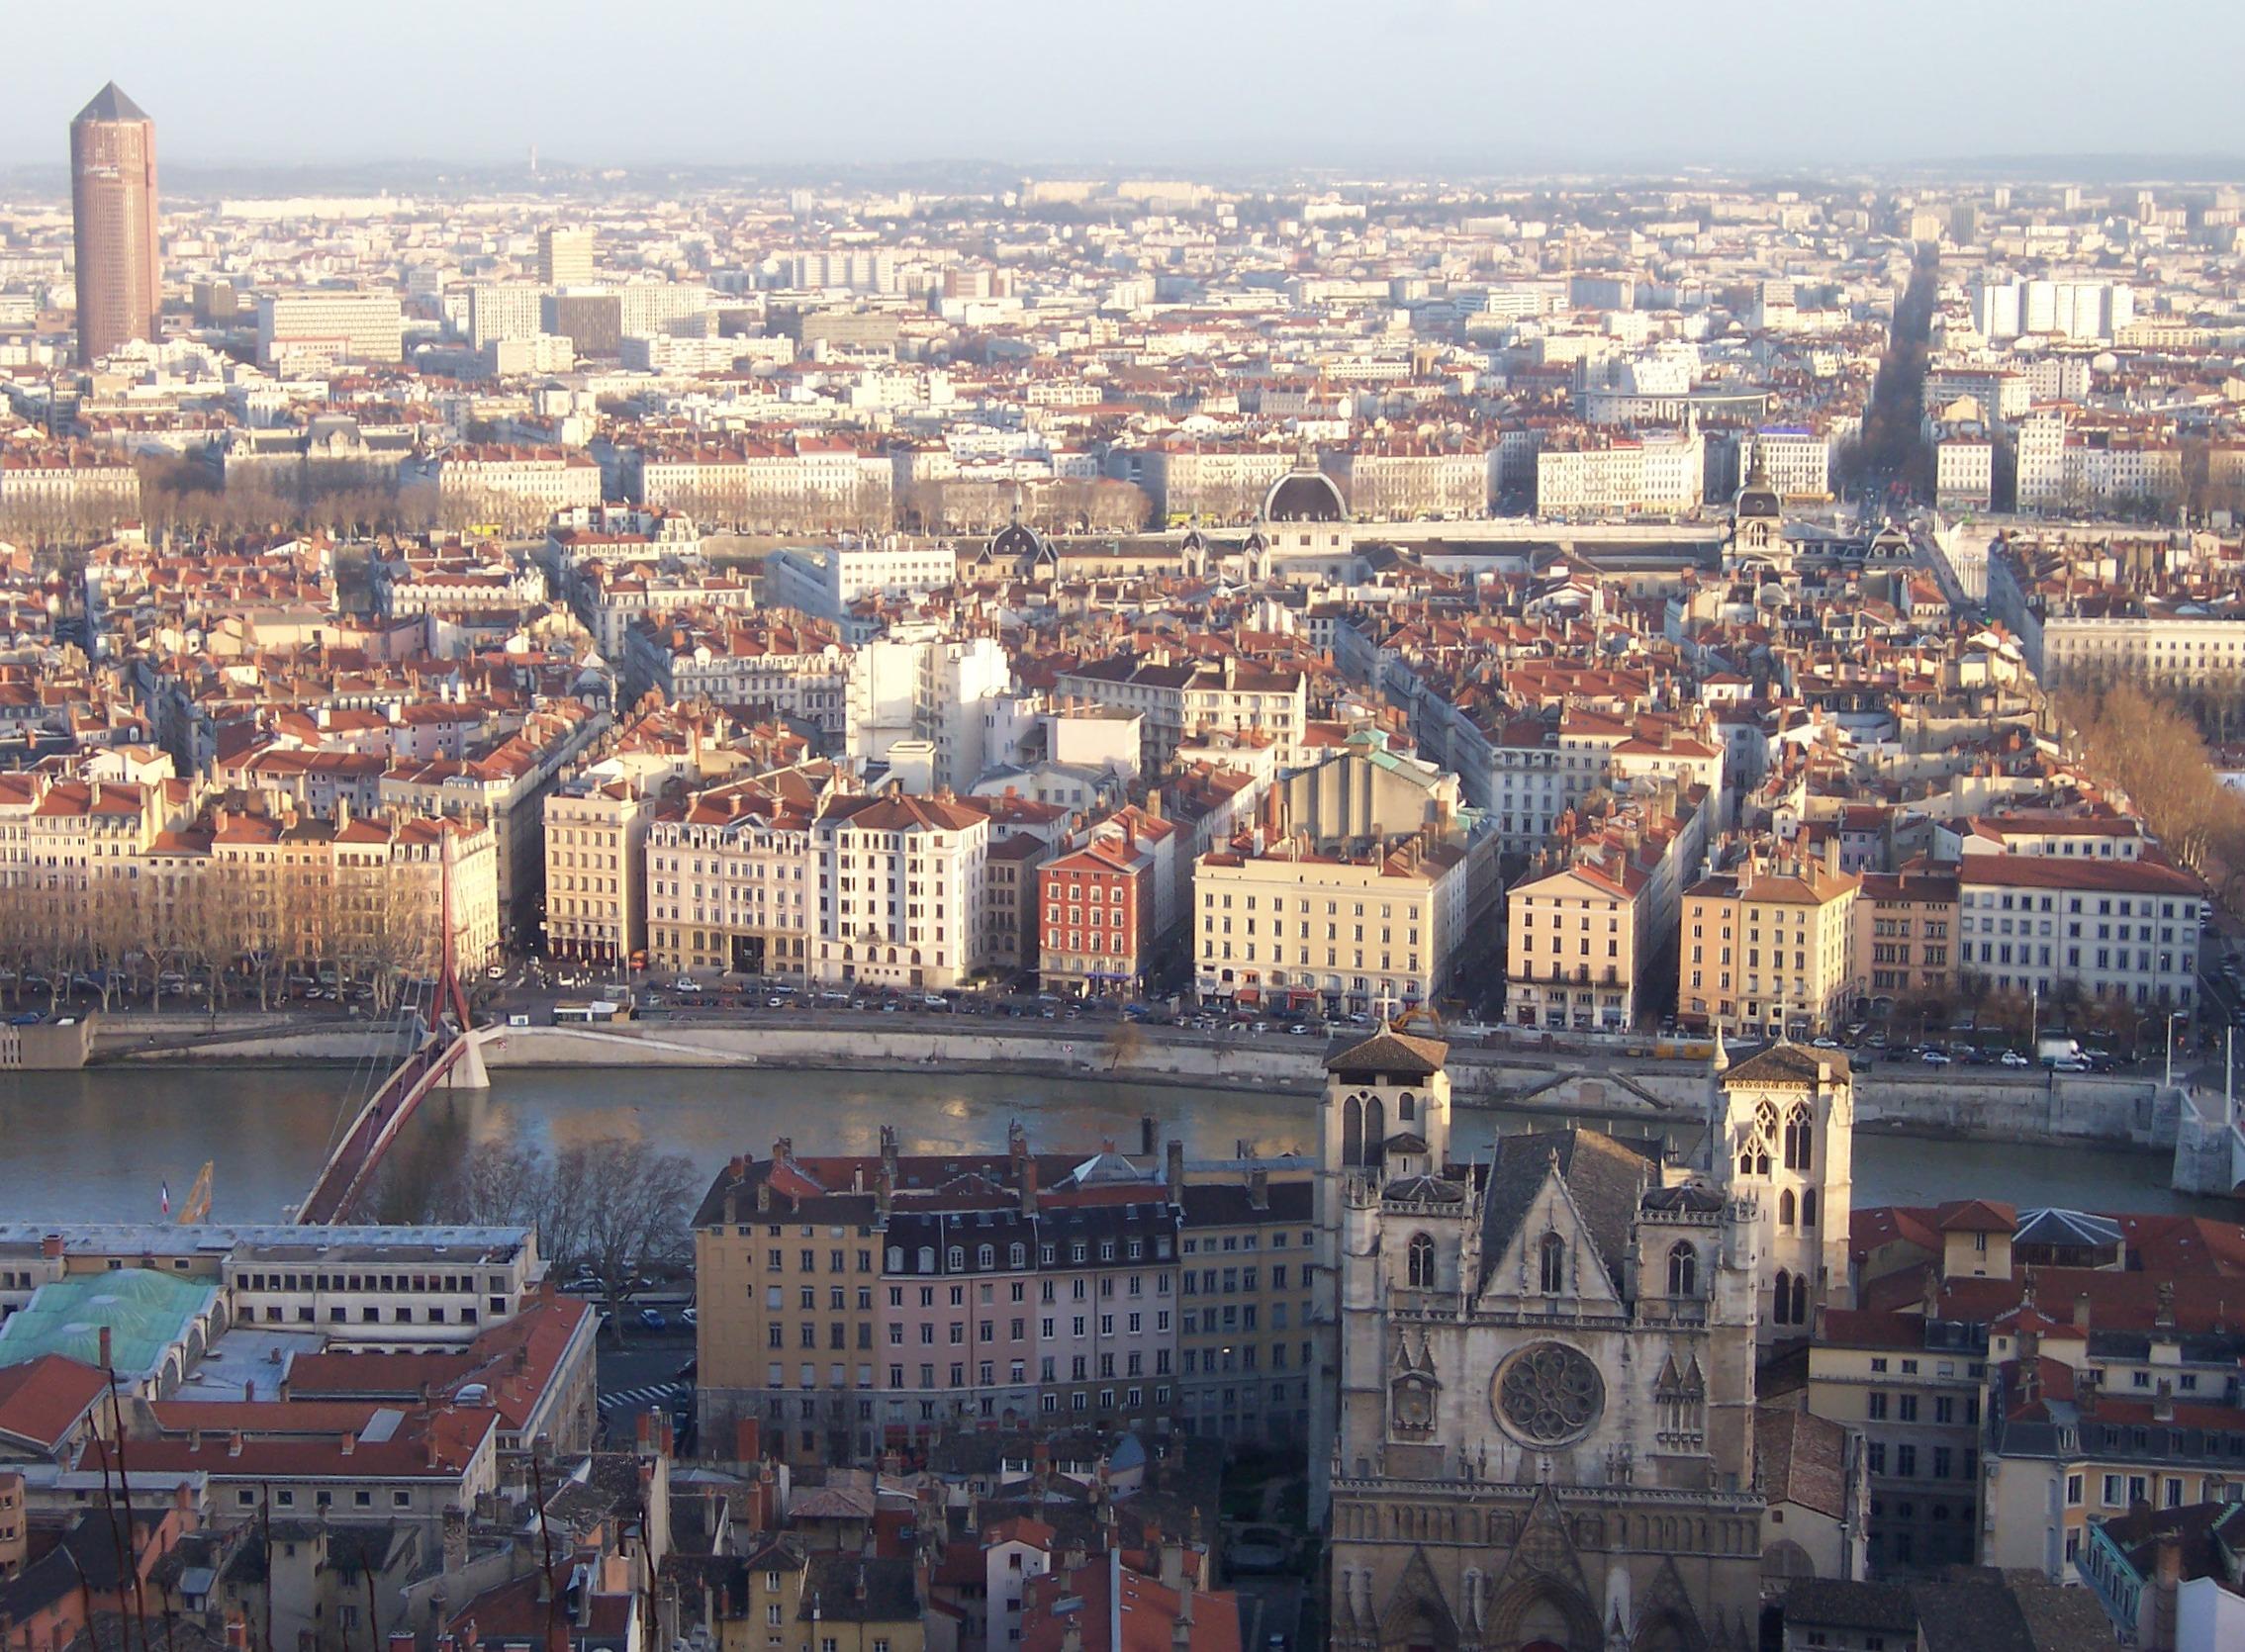 investissement locatif Lyon - achat appartement - investissement locatif - achat appartement Lyon